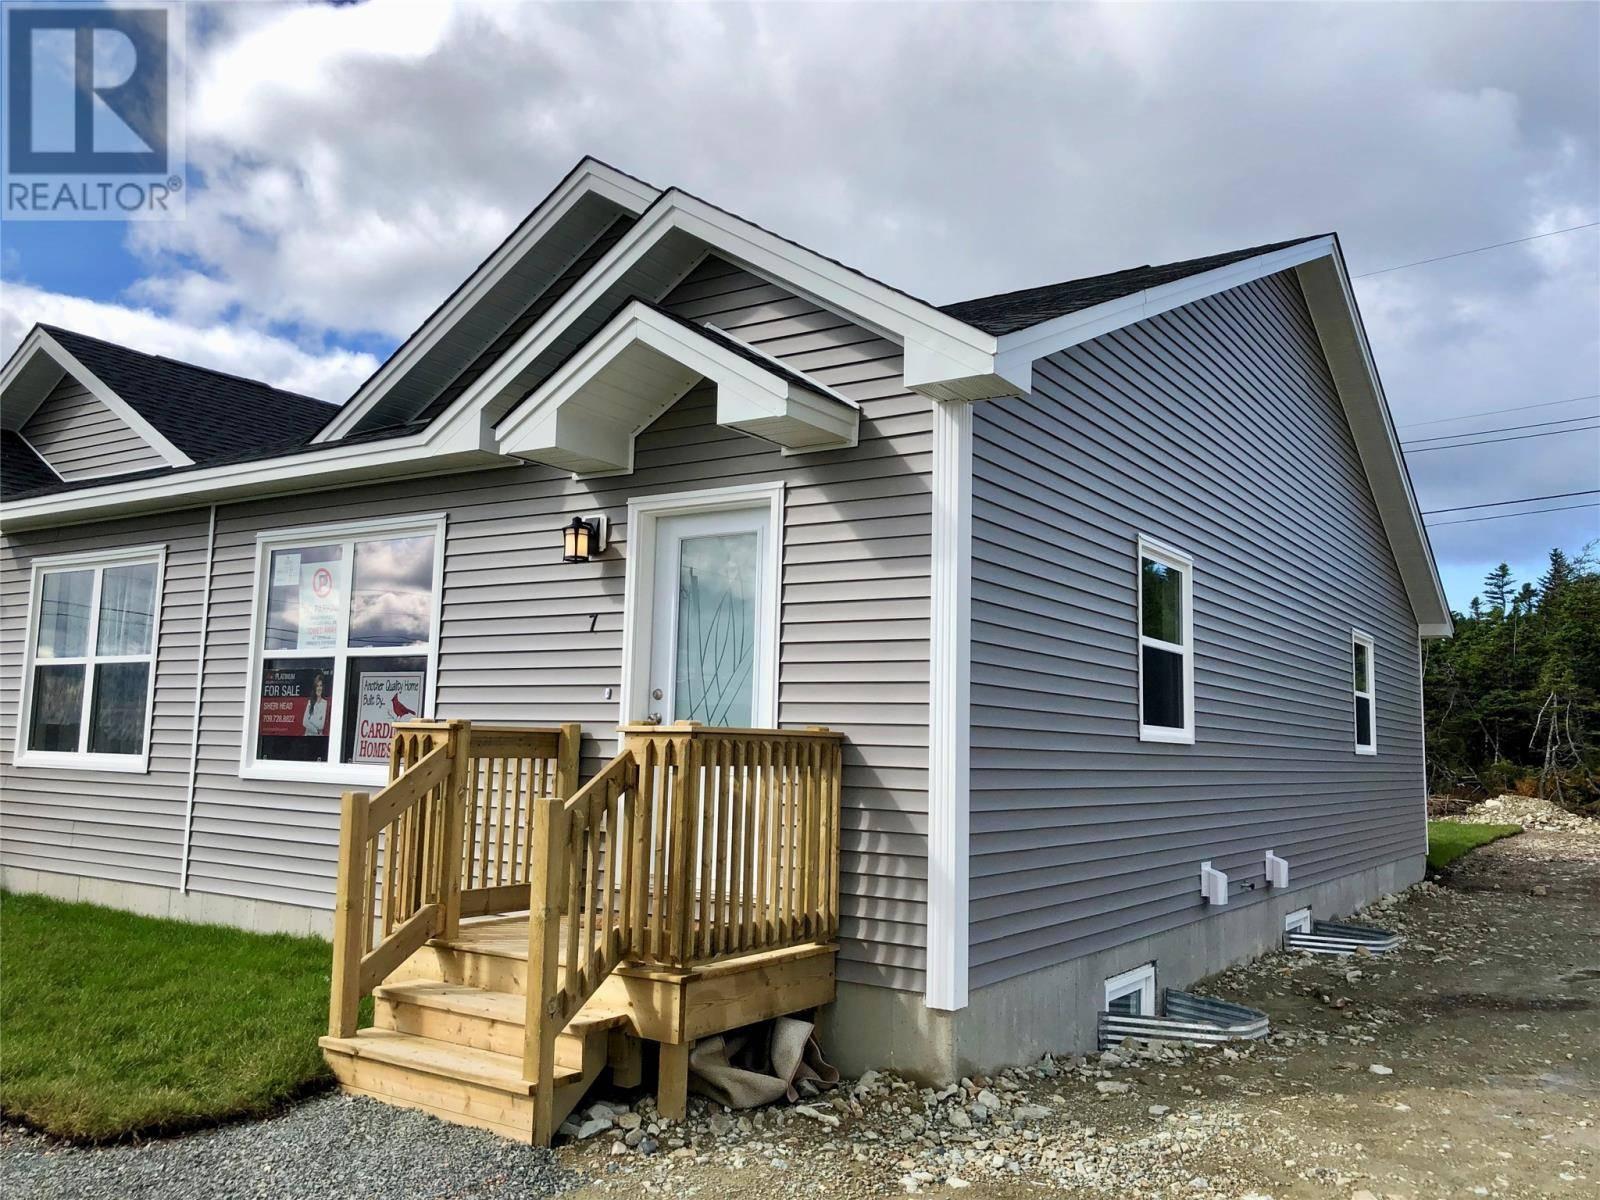 House for sale at 7 Larsen St Mount Pearl Newfoundland - MLS: 1198405